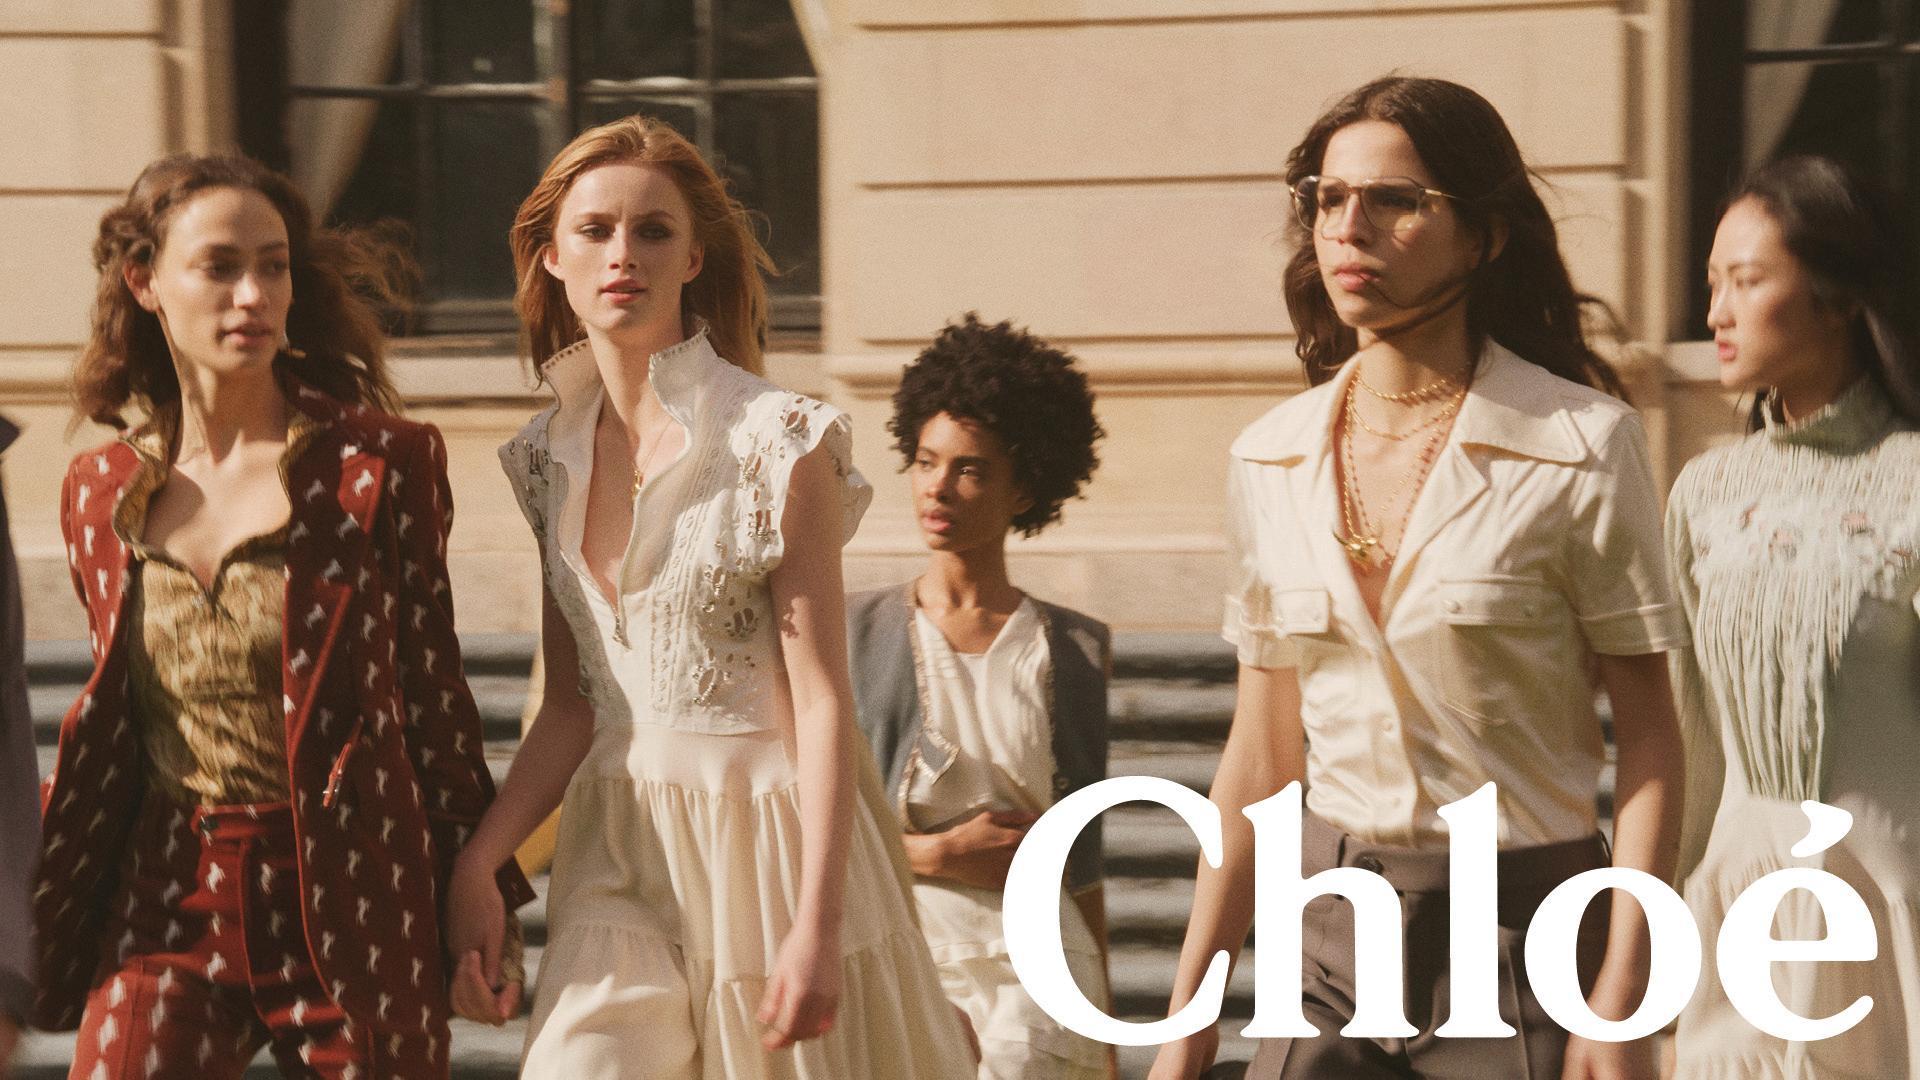 master_chloe_ss18_fashion1_1920x1080